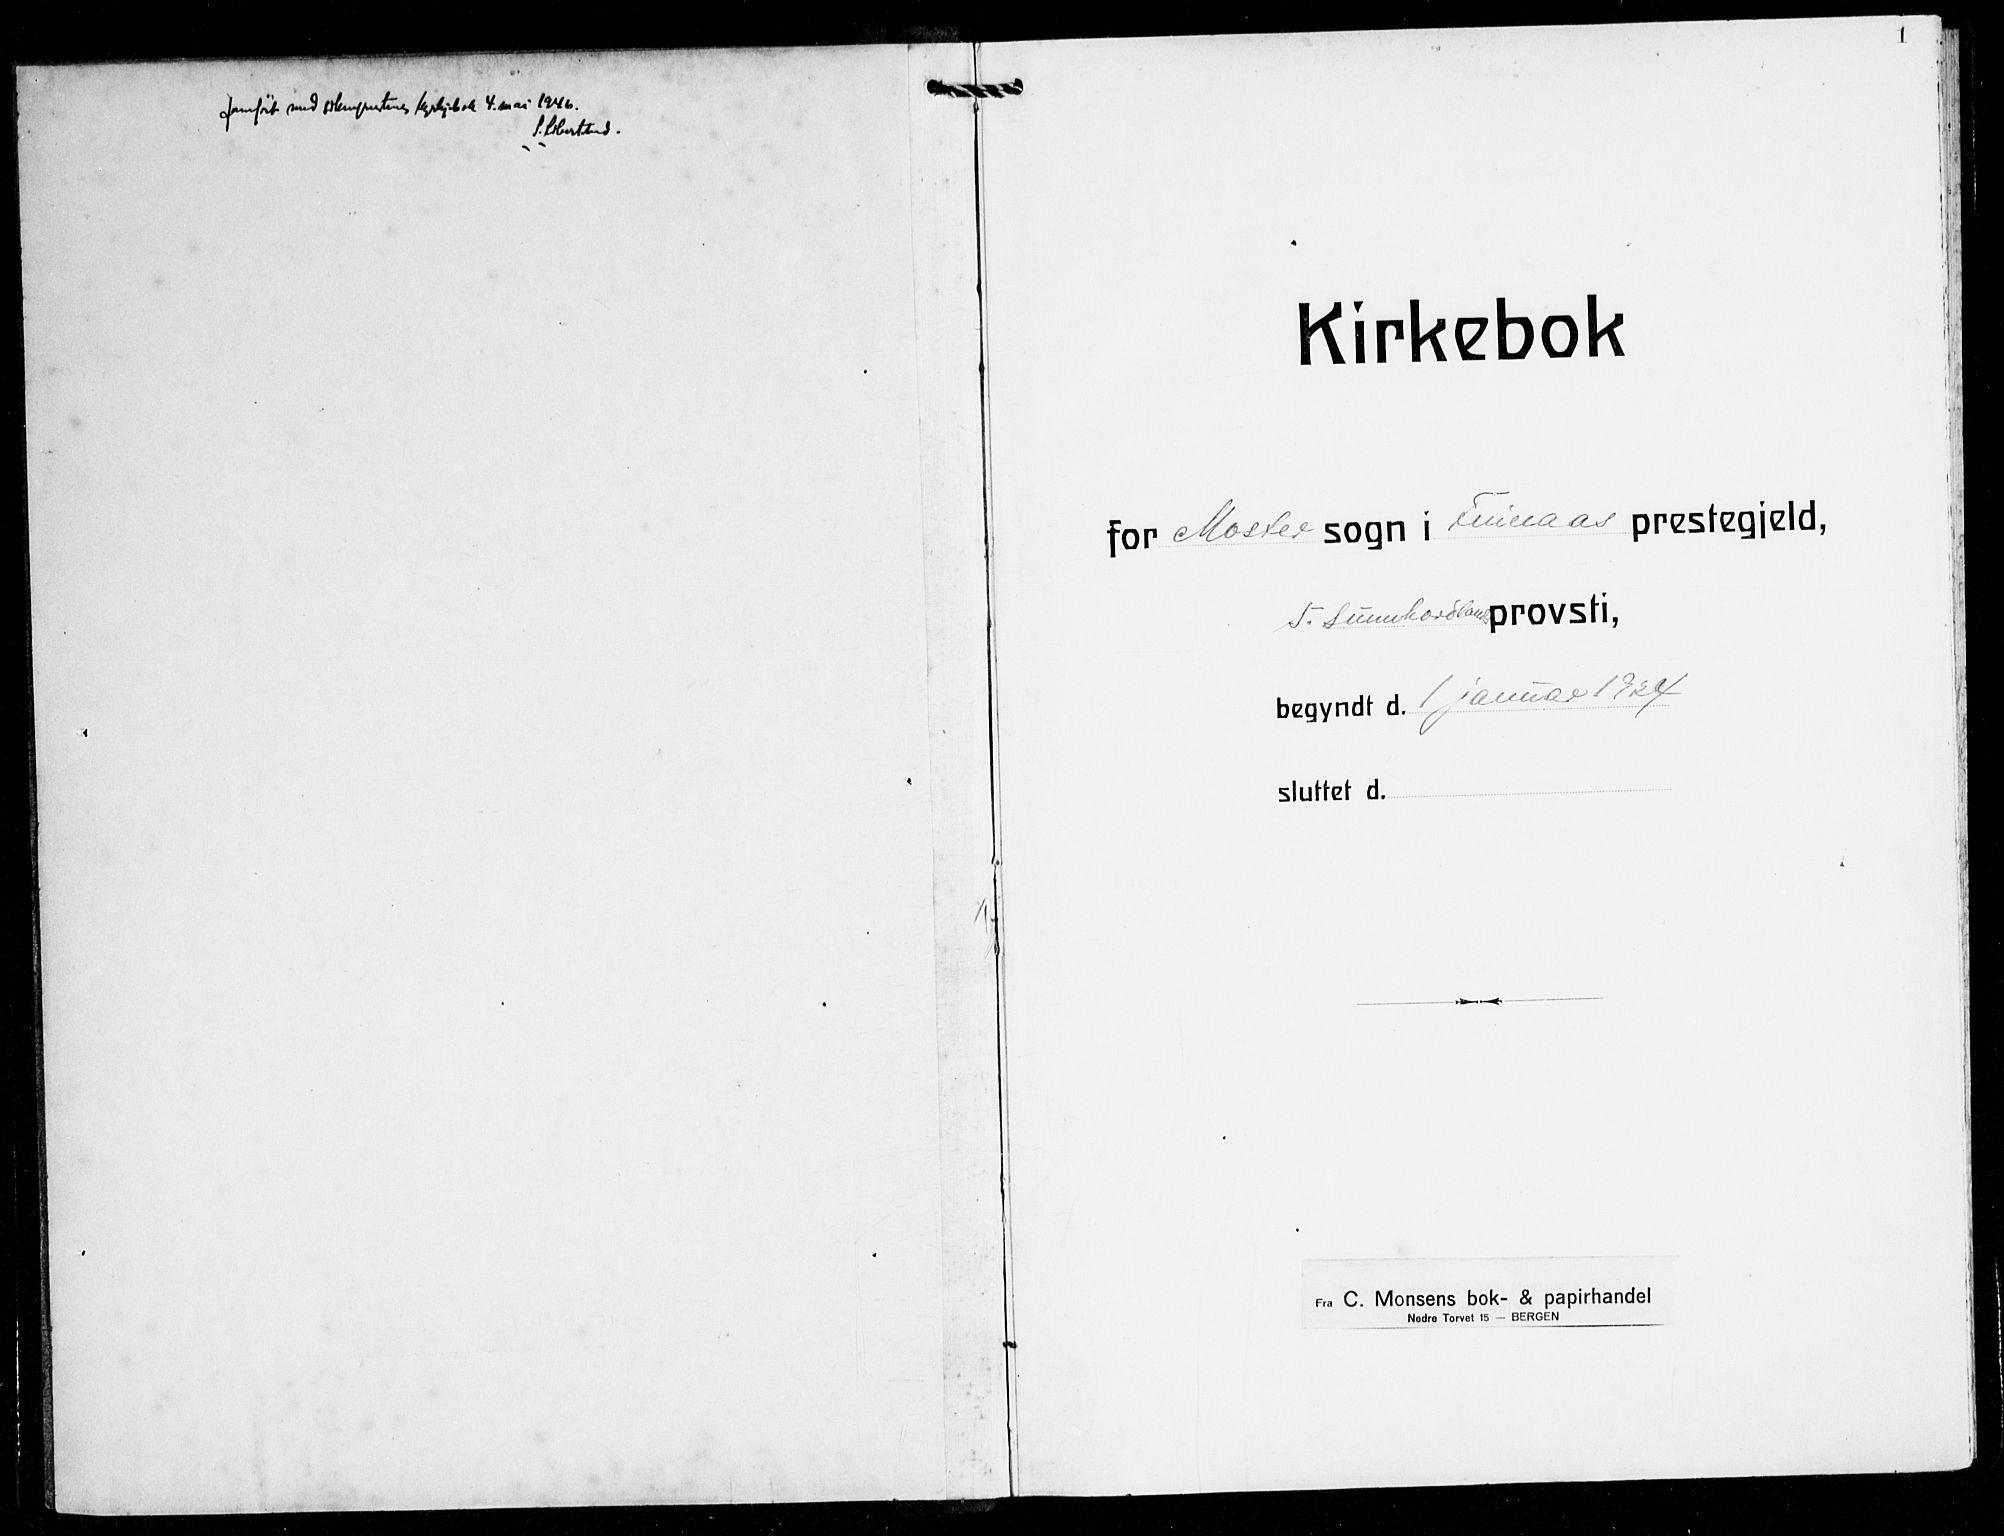 SAB, Finnås sokneprestembete, H/Ha/Hab/Haba/L0005: Klokkerbok nr. A 5, 1924-1945, s. 1